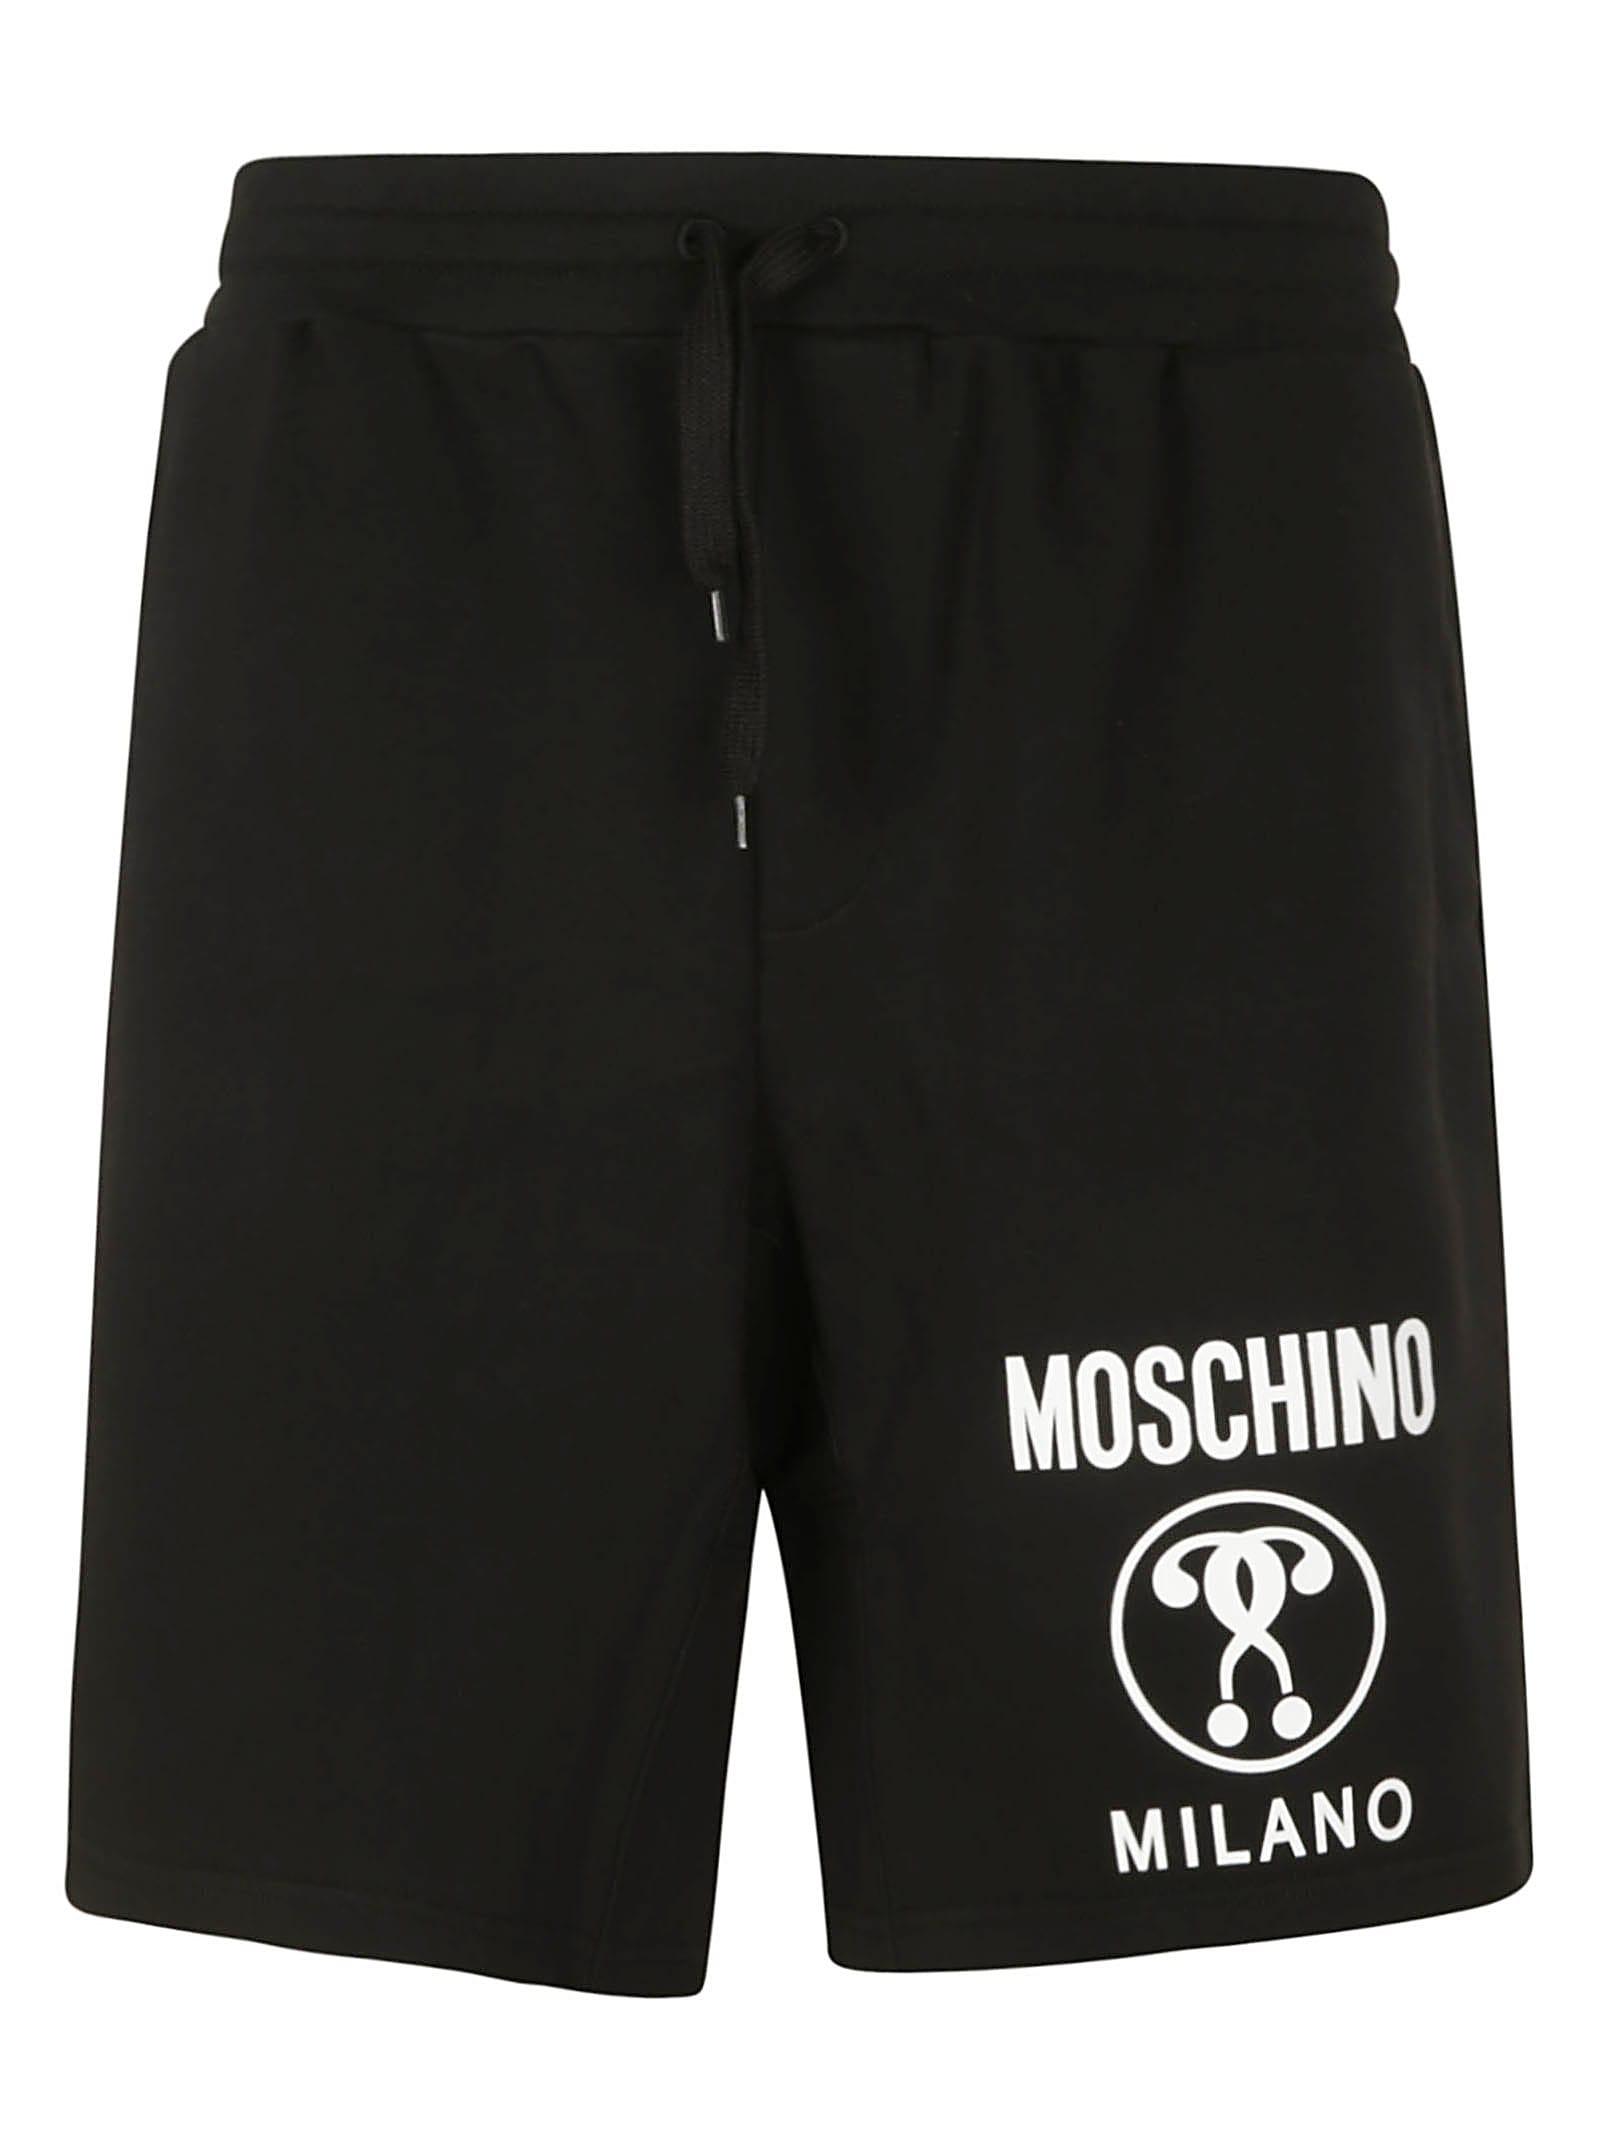 Moschino MILANO LOGO SHORTS